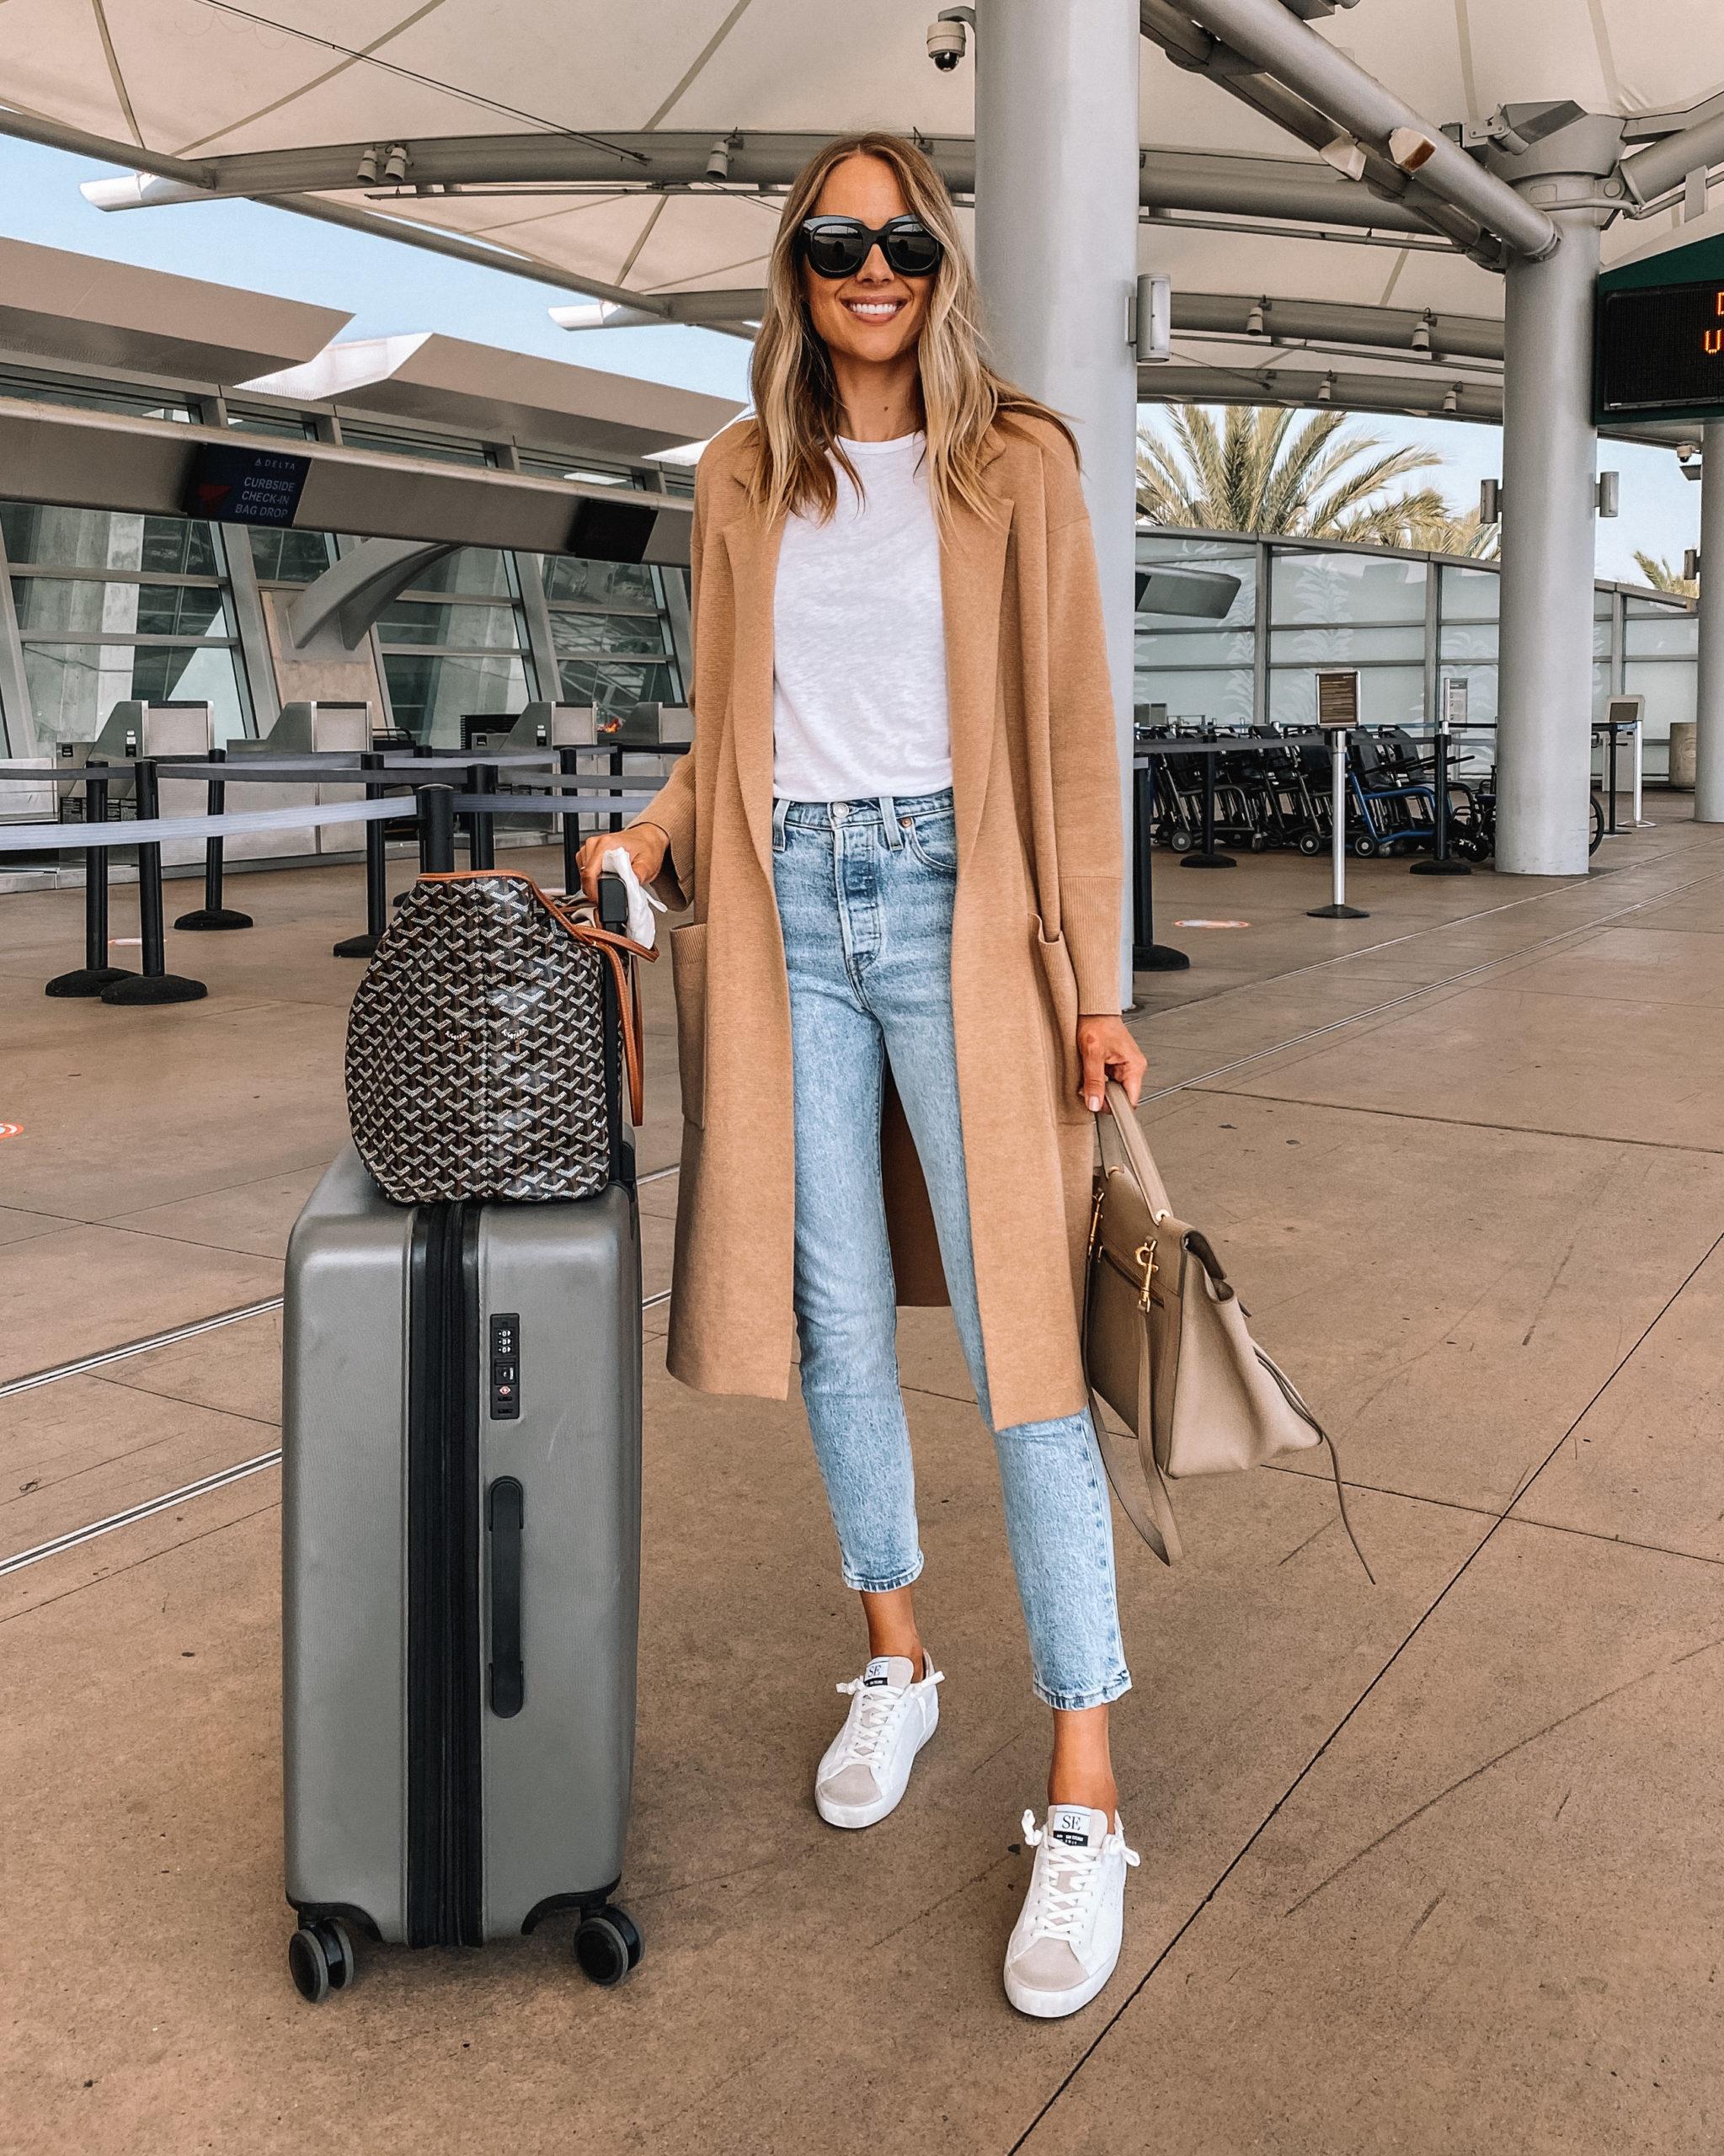 Fashion Jackson Travel Outfit Camel Coatigan White Tshirt Denim Jeans White Sneakers